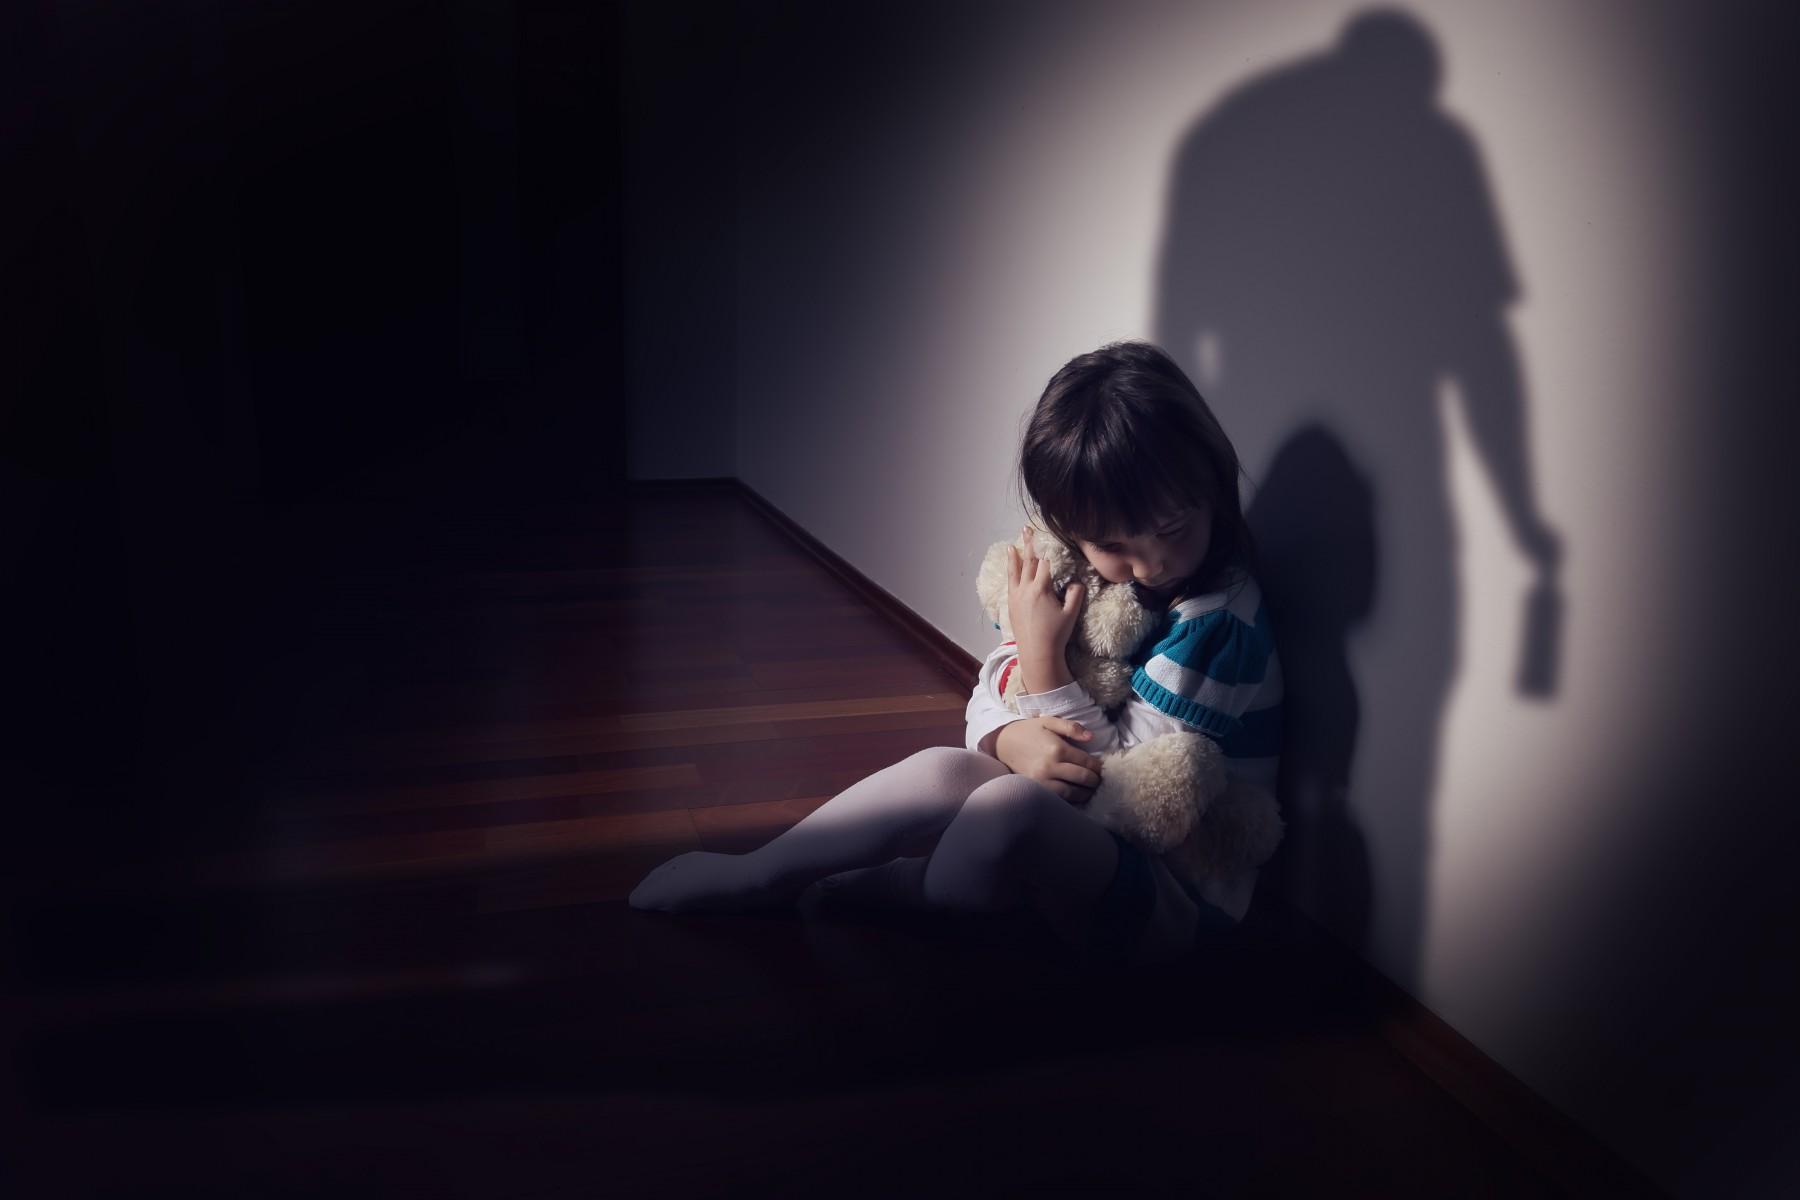 Rob Kardashian Puts 'Cheating' Ex Blac Chyna on Blast with Graphic photos of child abuse